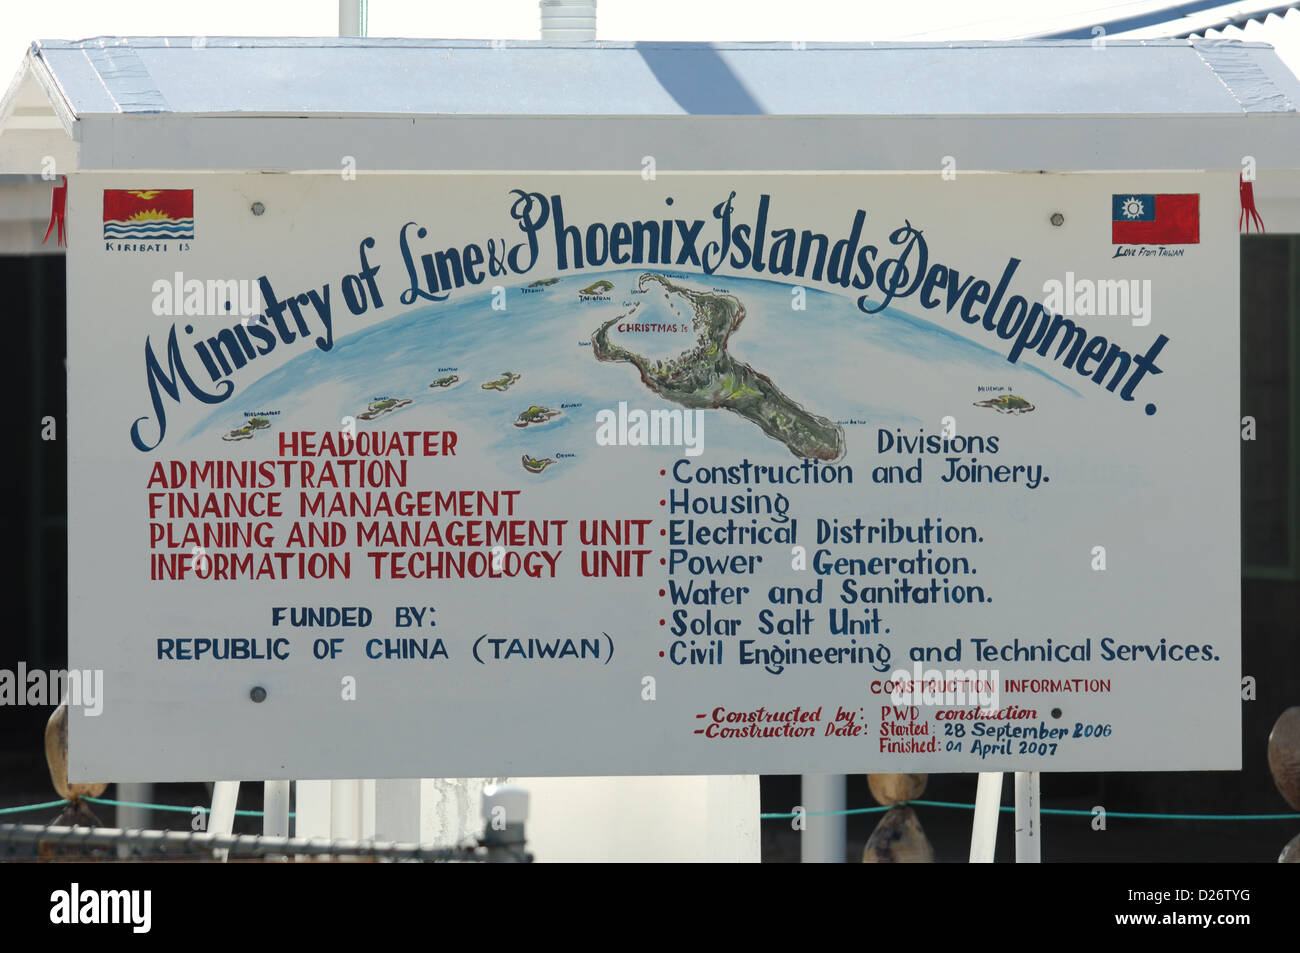 Ministry of Development at Christmas Island, Kiribati - Stock Image